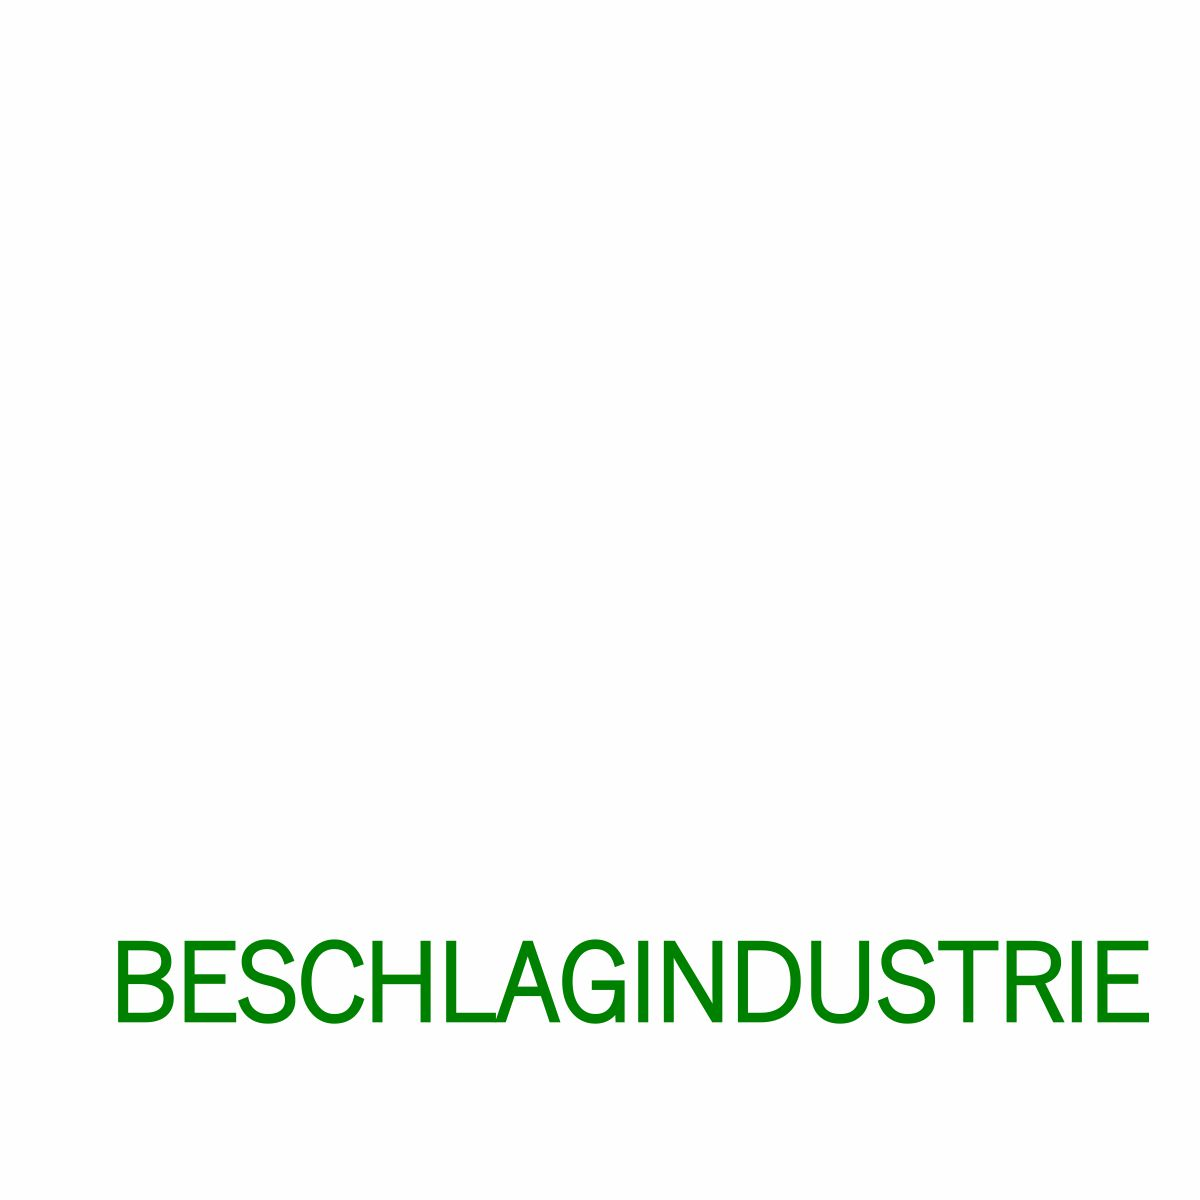 Grafik Branche Beschlagindustrie